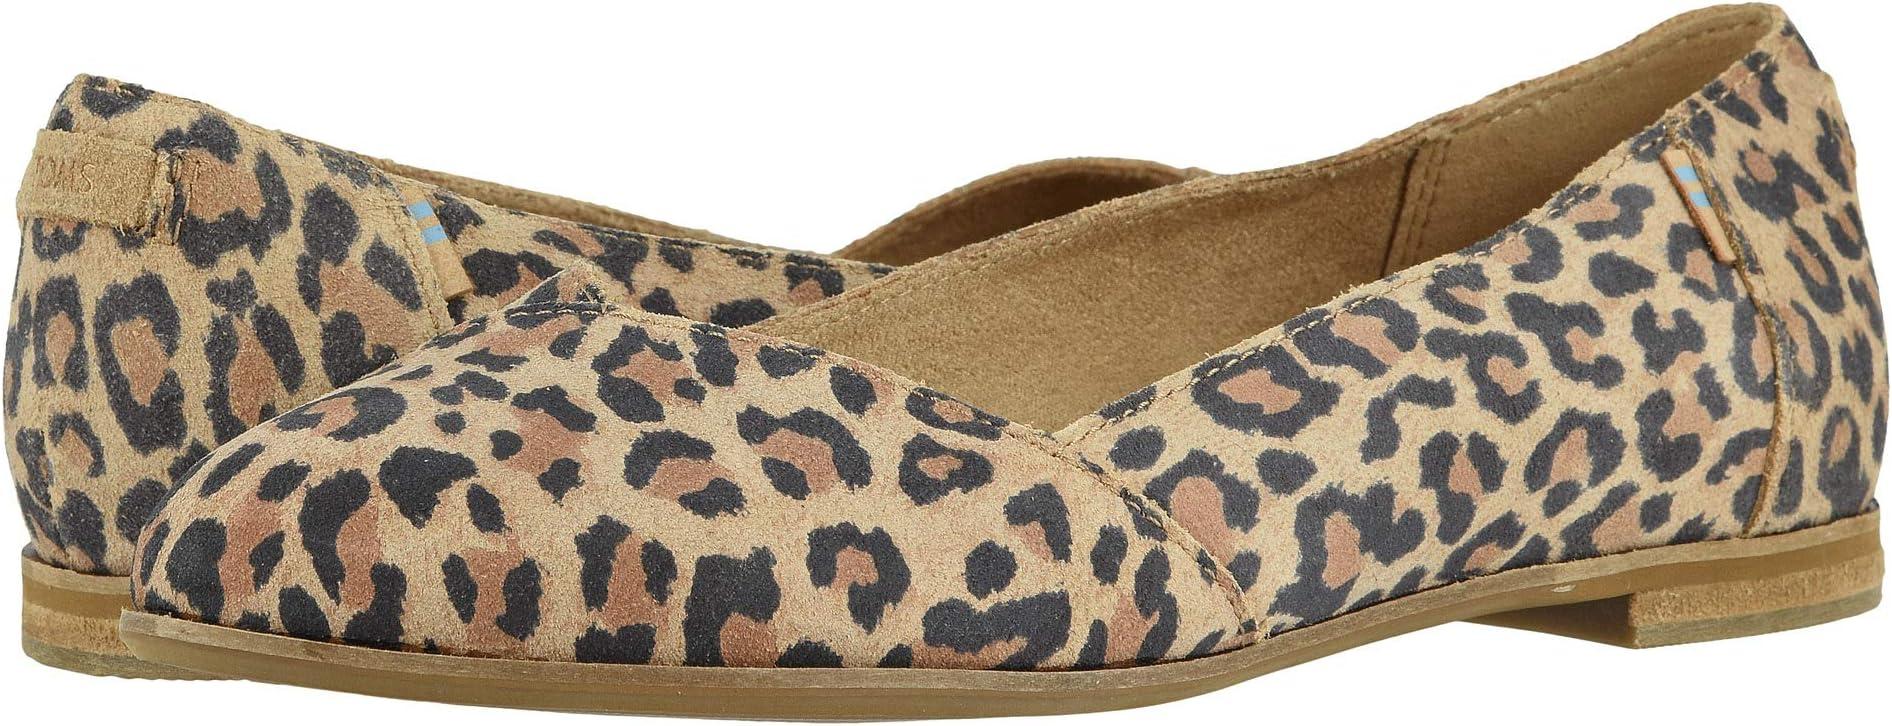 eb41ea9785331 TOMS Shoes | Zappos.com